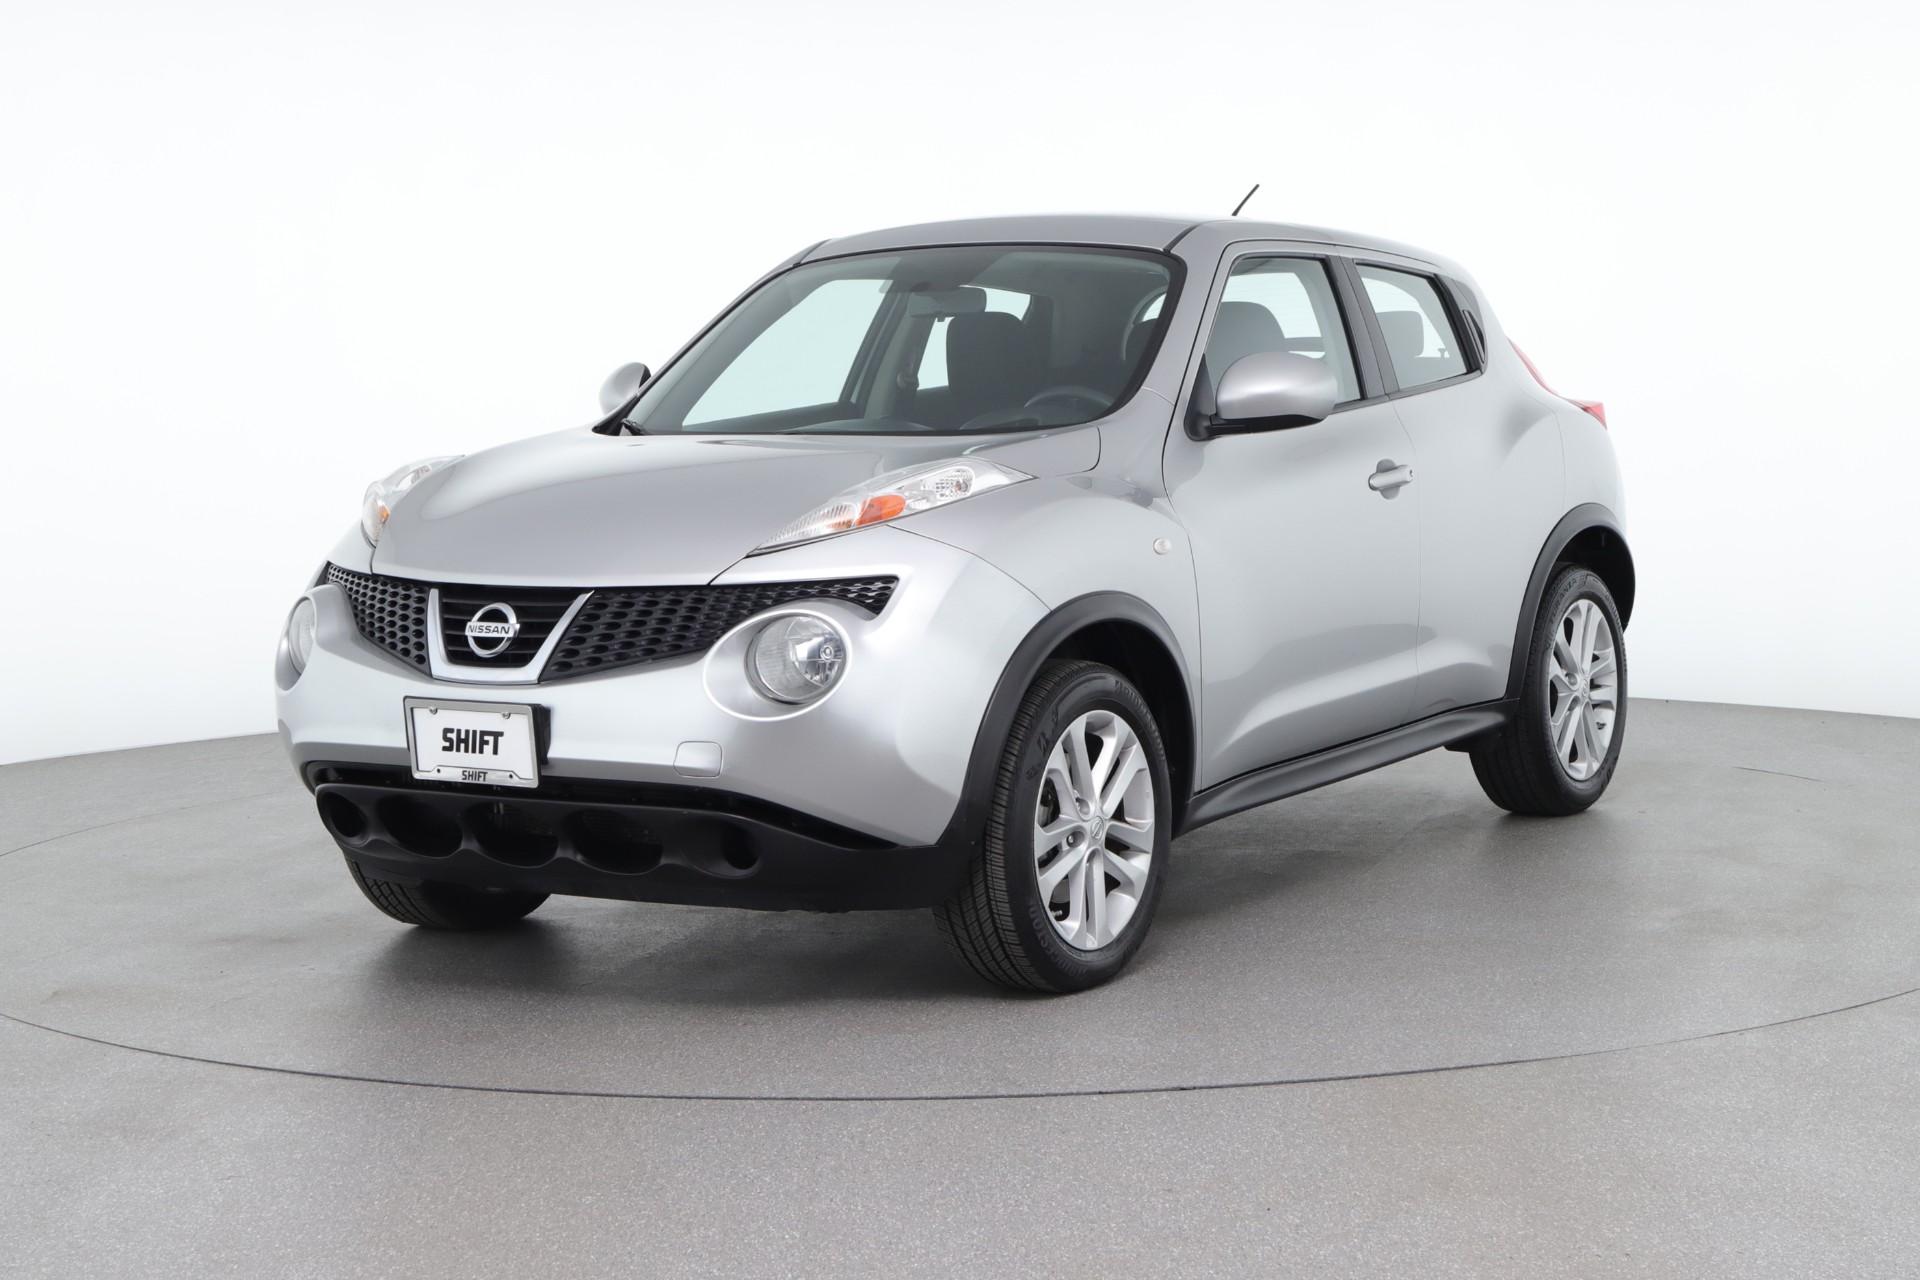 2011 Nissan JUKE S (from $9,100)